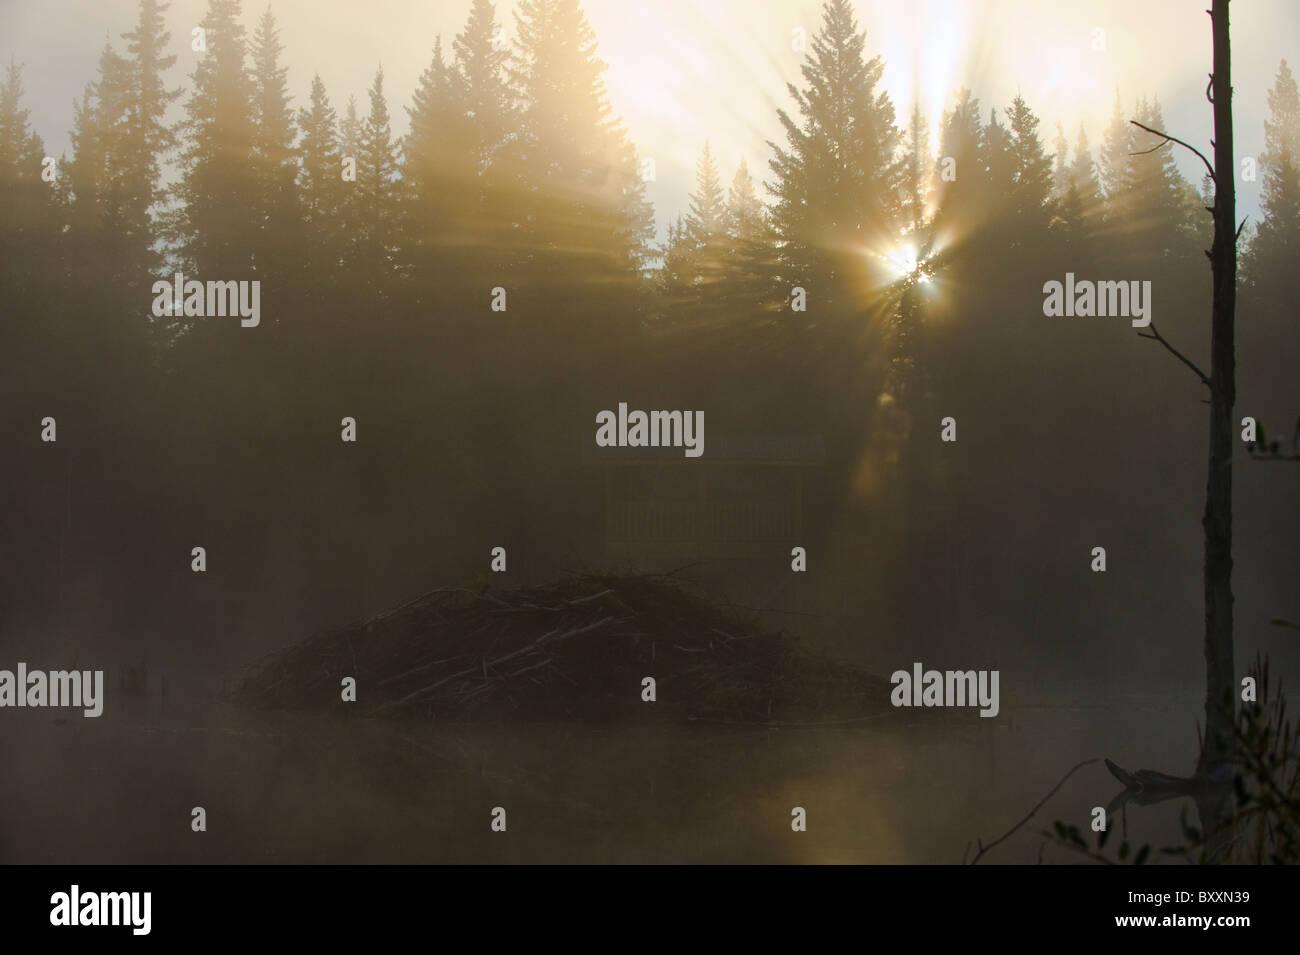 A sunrise image of the beaver lodge on a fog filled autumn morning - Stock Image